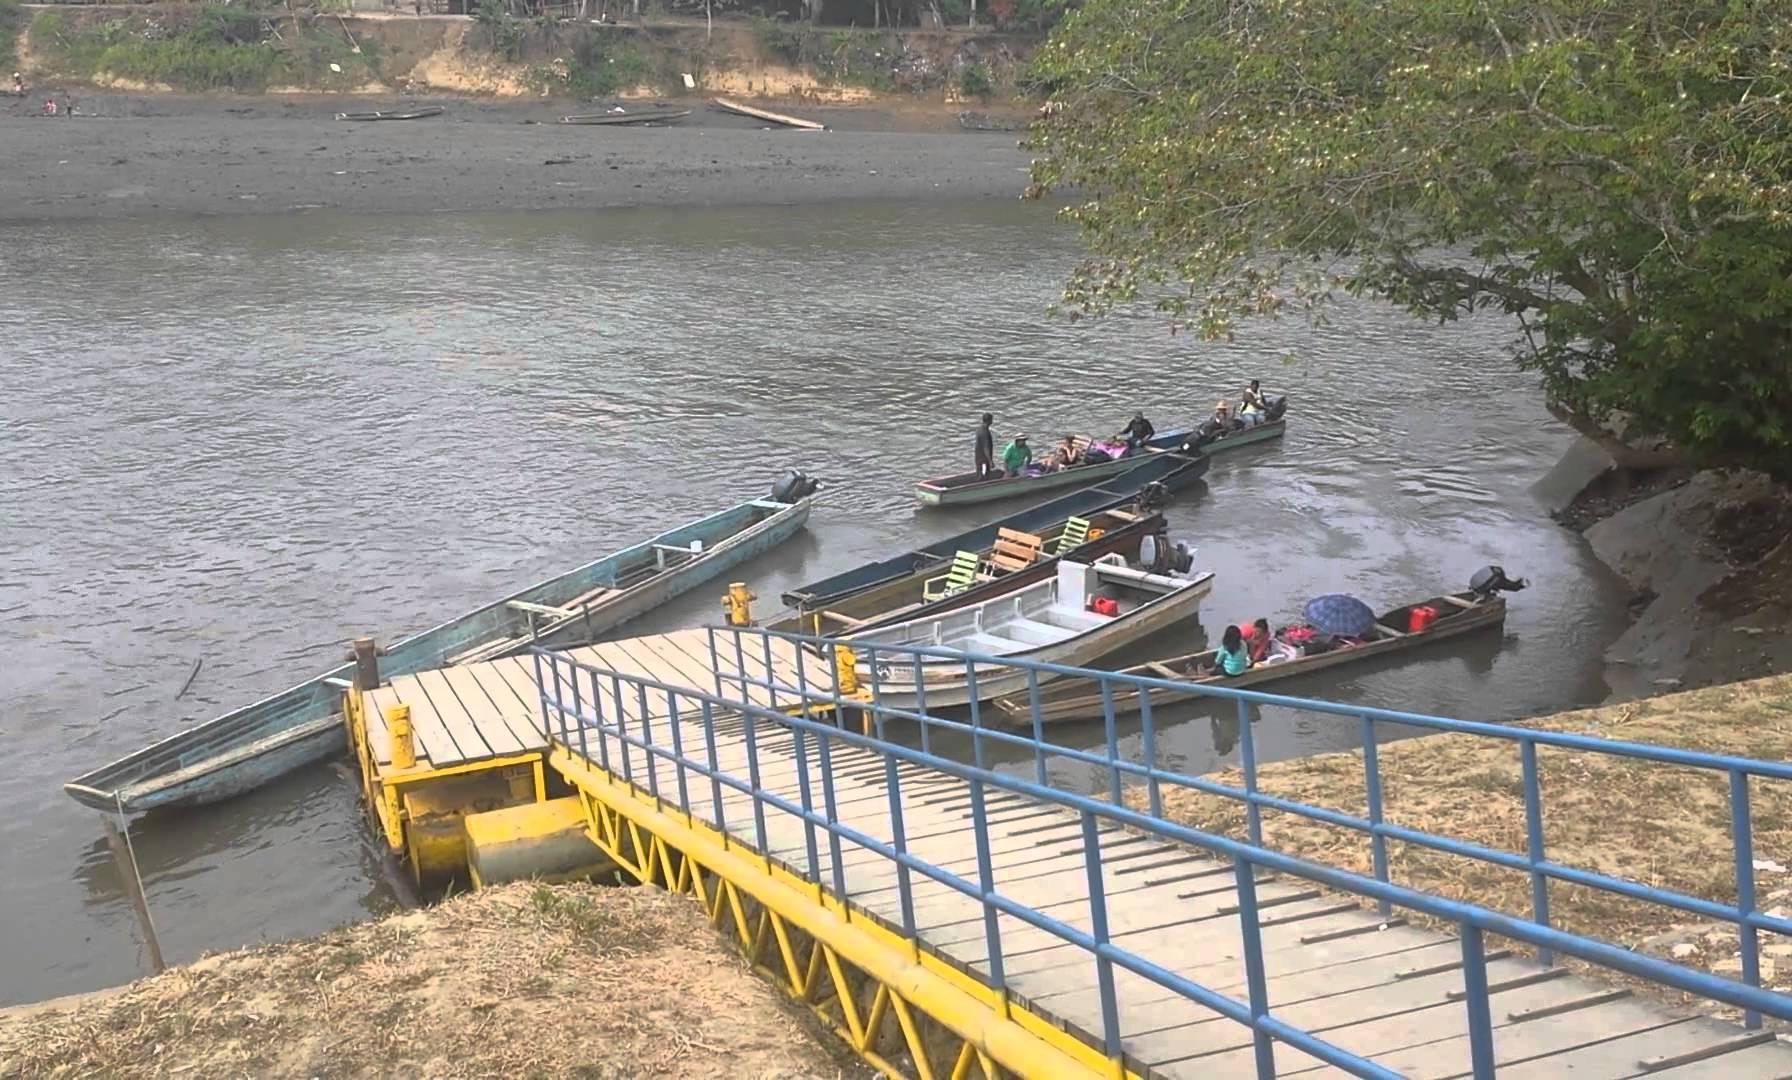 River Ferry Shuttling Passengers in Yaviza, Panama